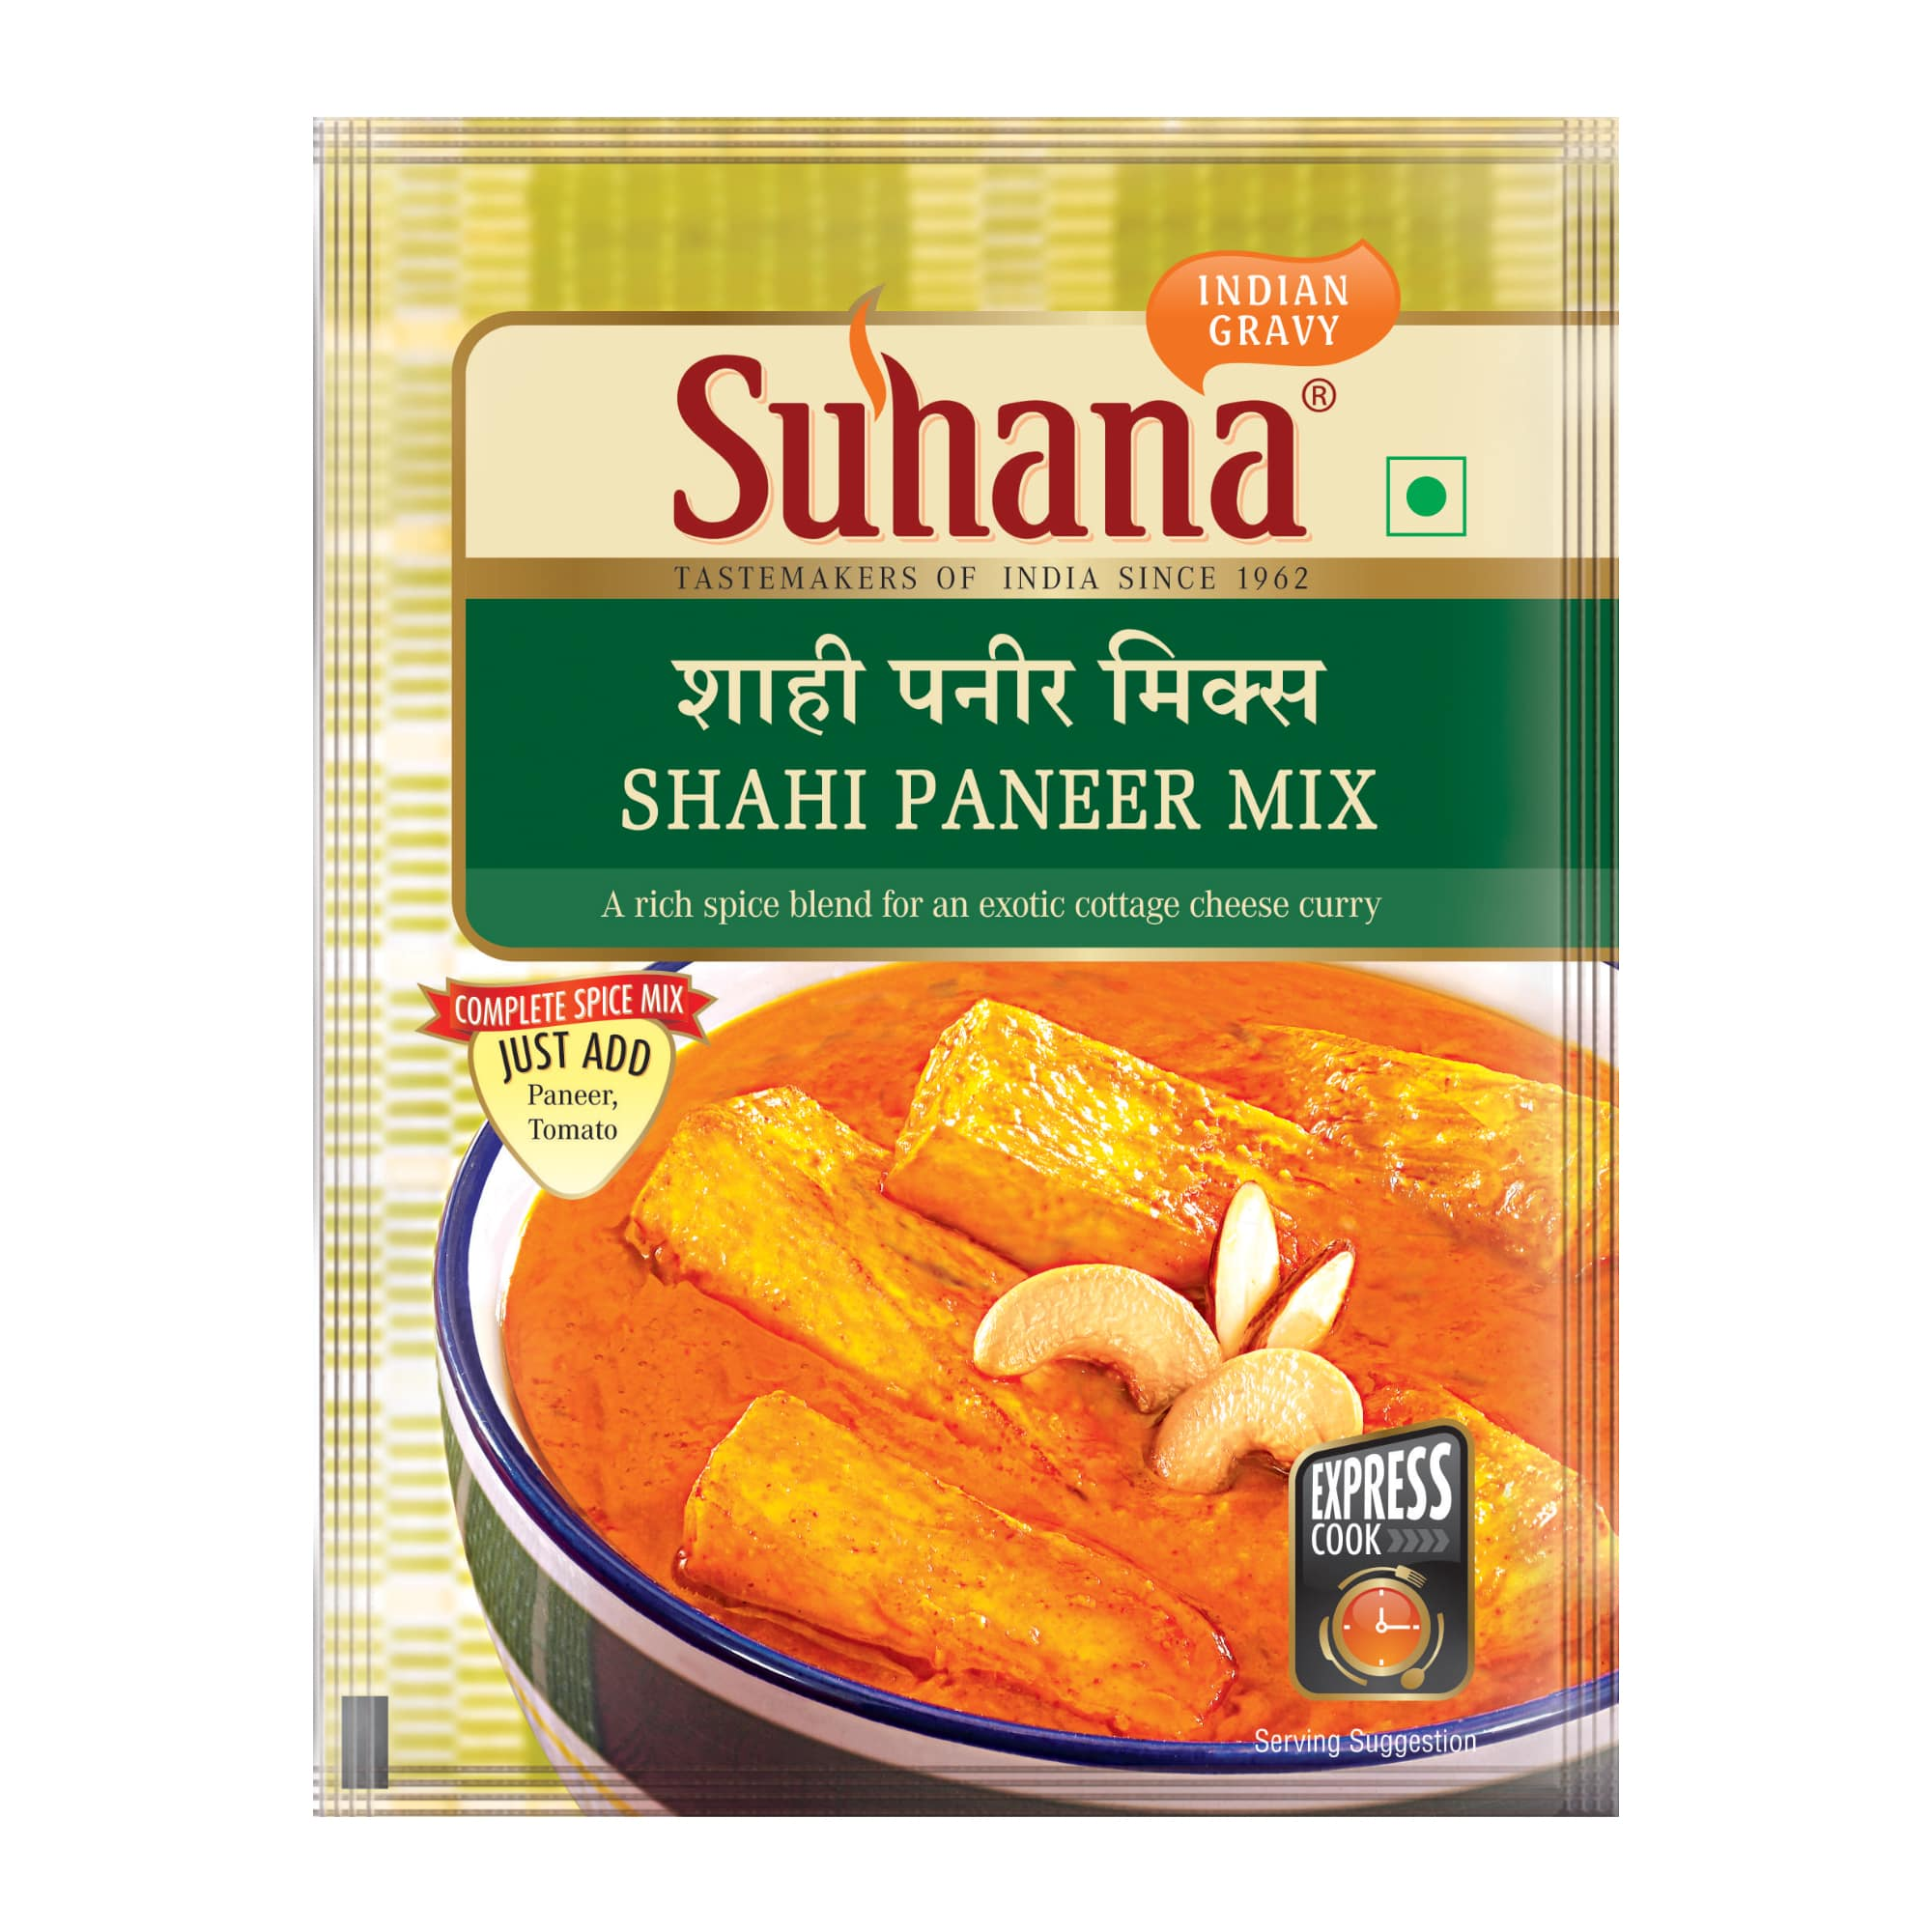 Suhana Shahi Paneer Spice Mix 50 g Pouch